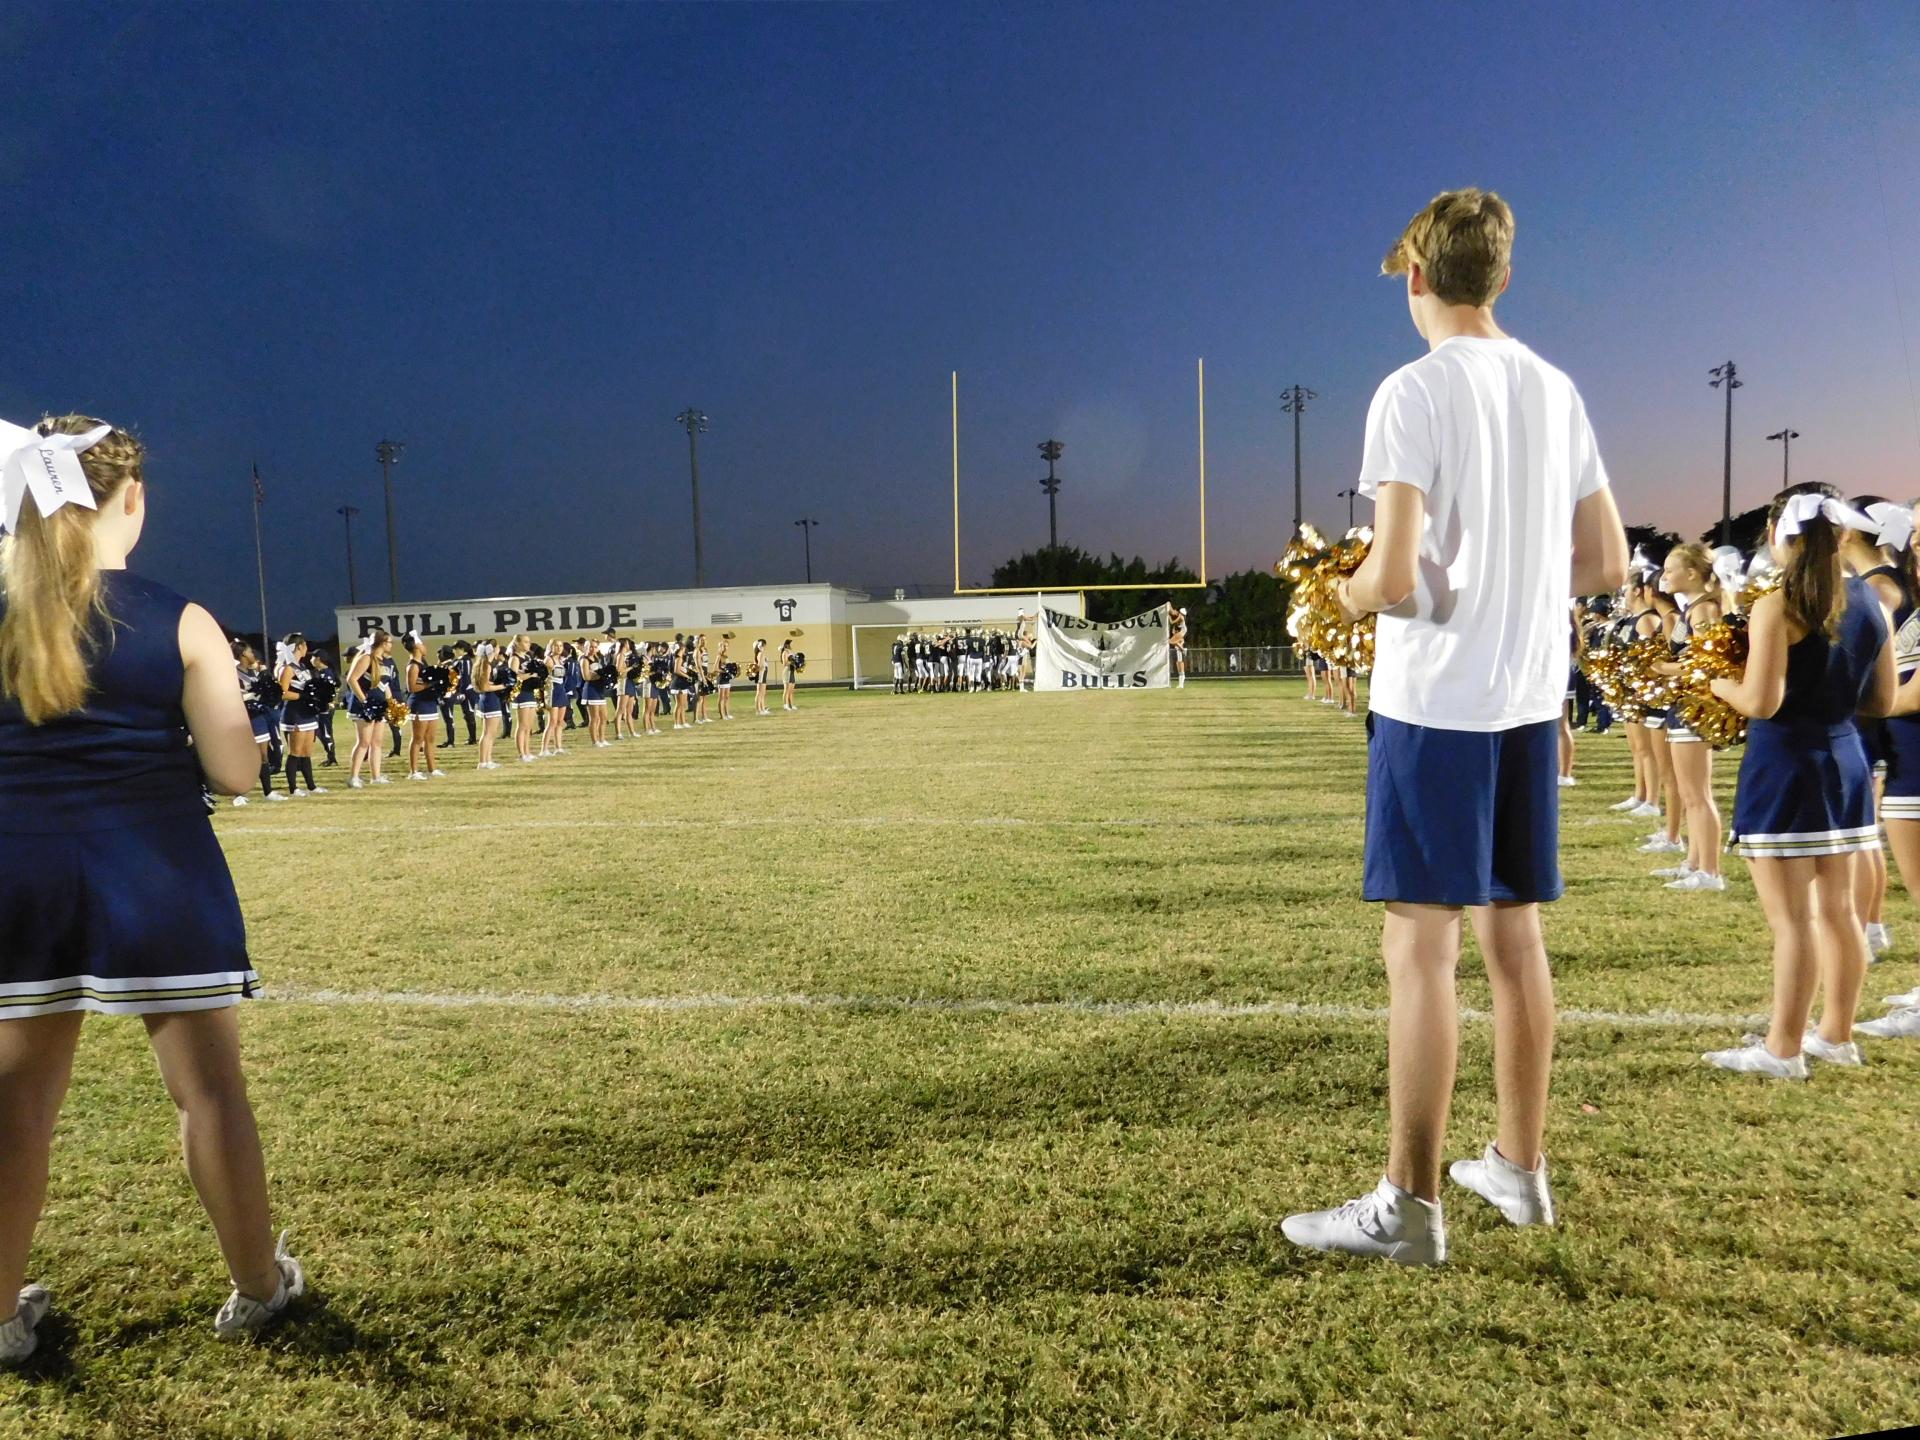 Jimmy Burns cheering at a Football Game   Photo by Meghan Zaffuta